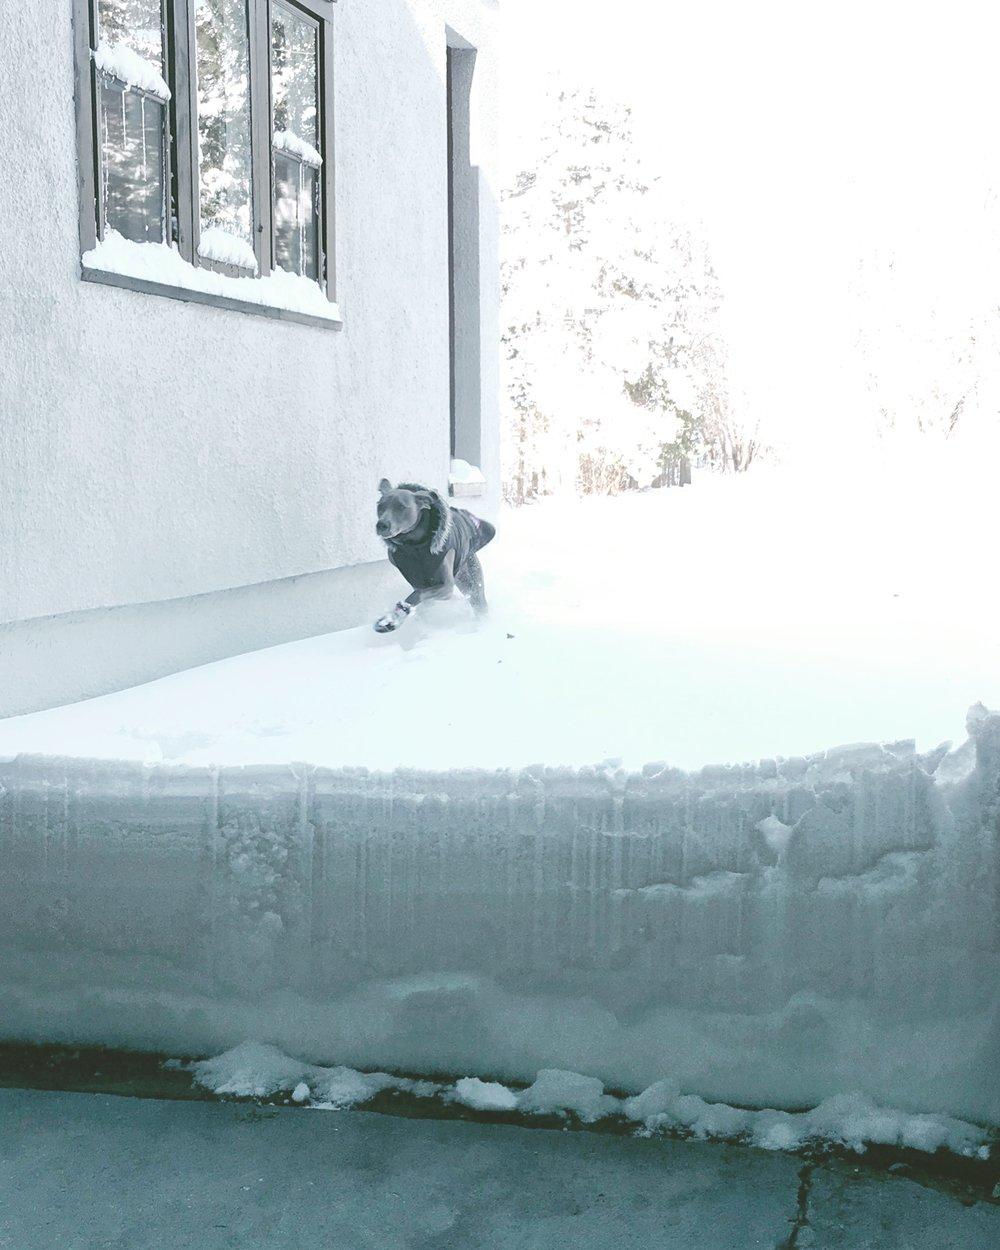 We got a lot of snow